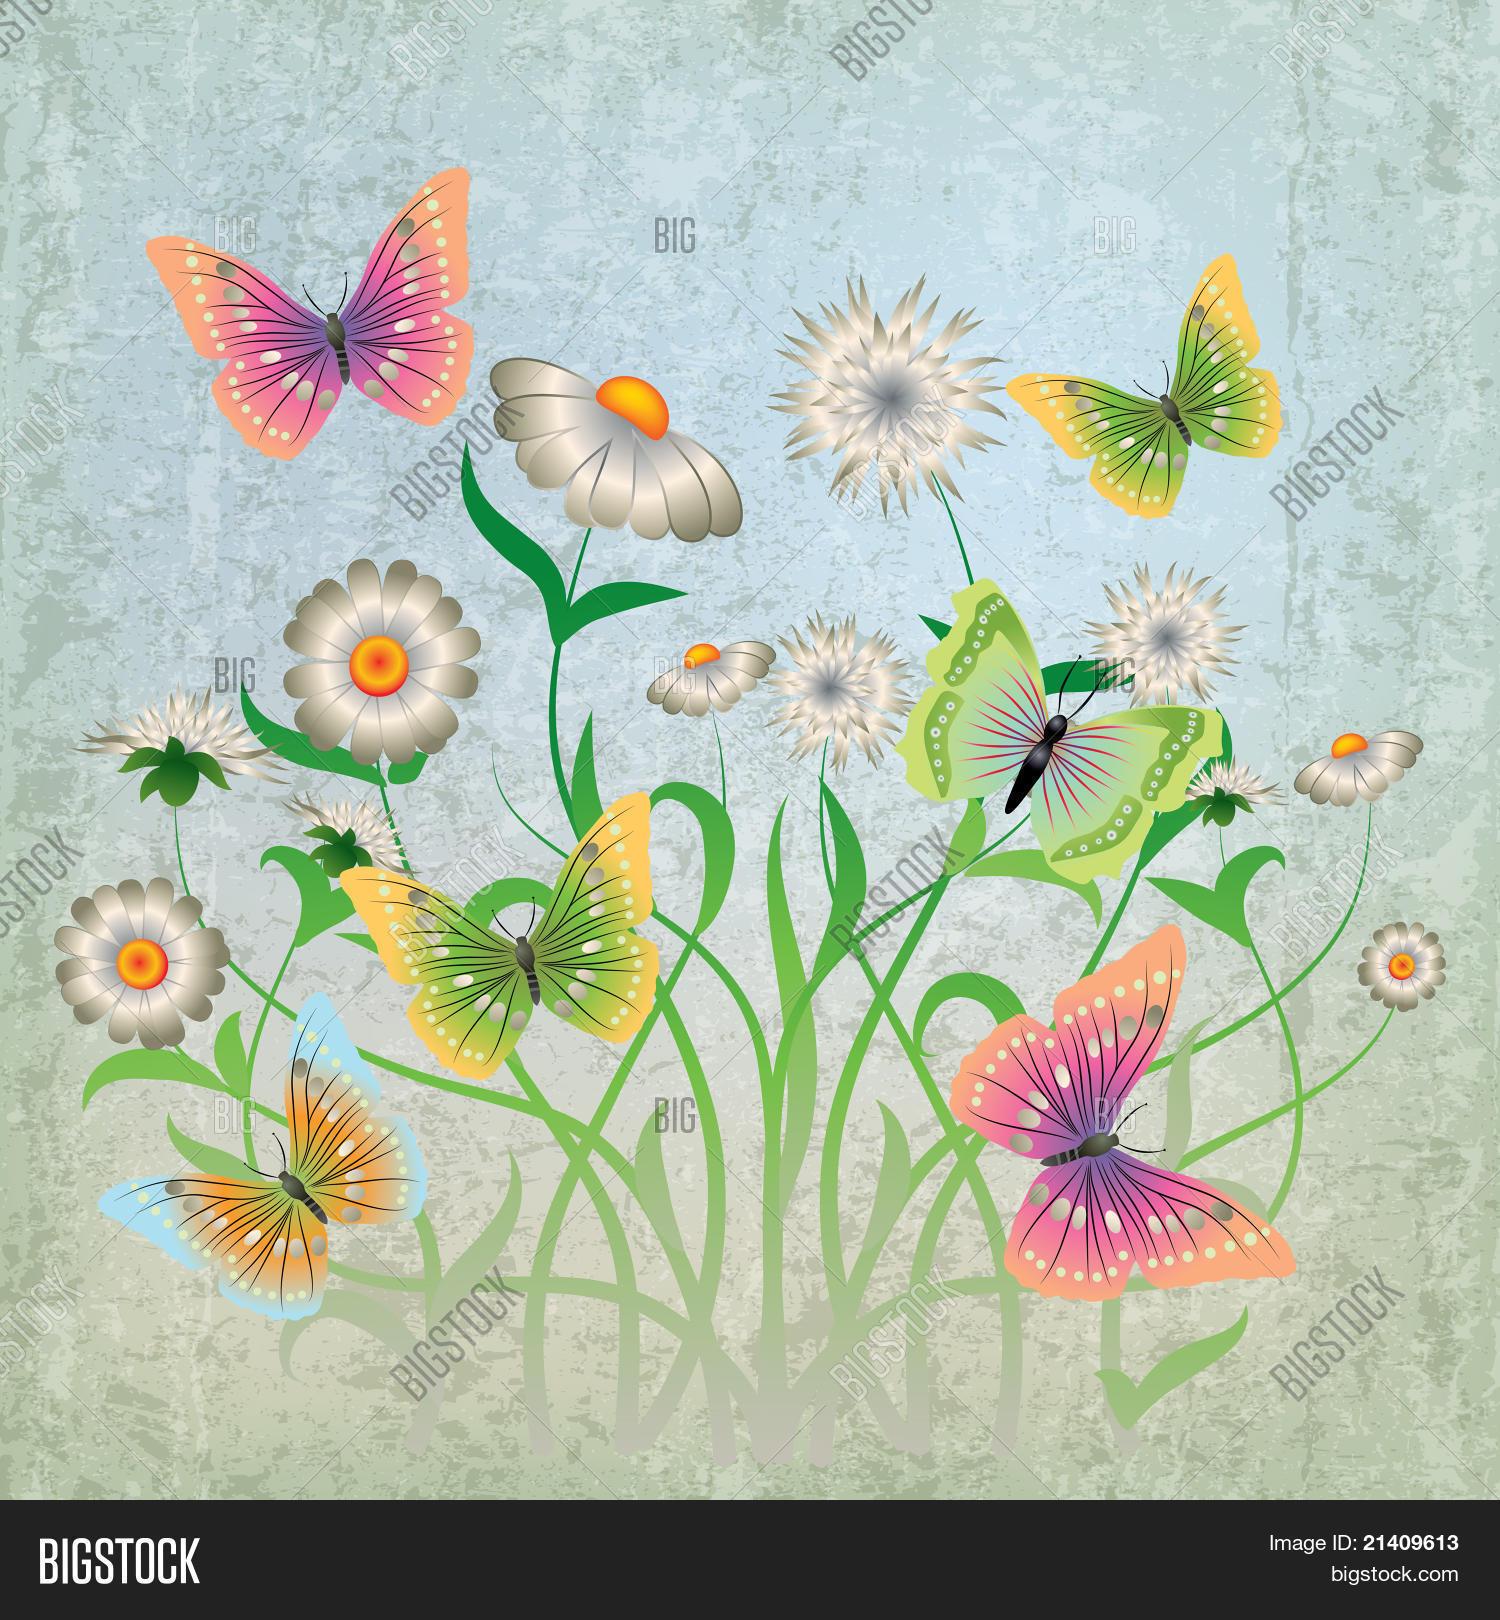 Morera de papel hecha a mano flores X Pack-Floral Fantasia 3